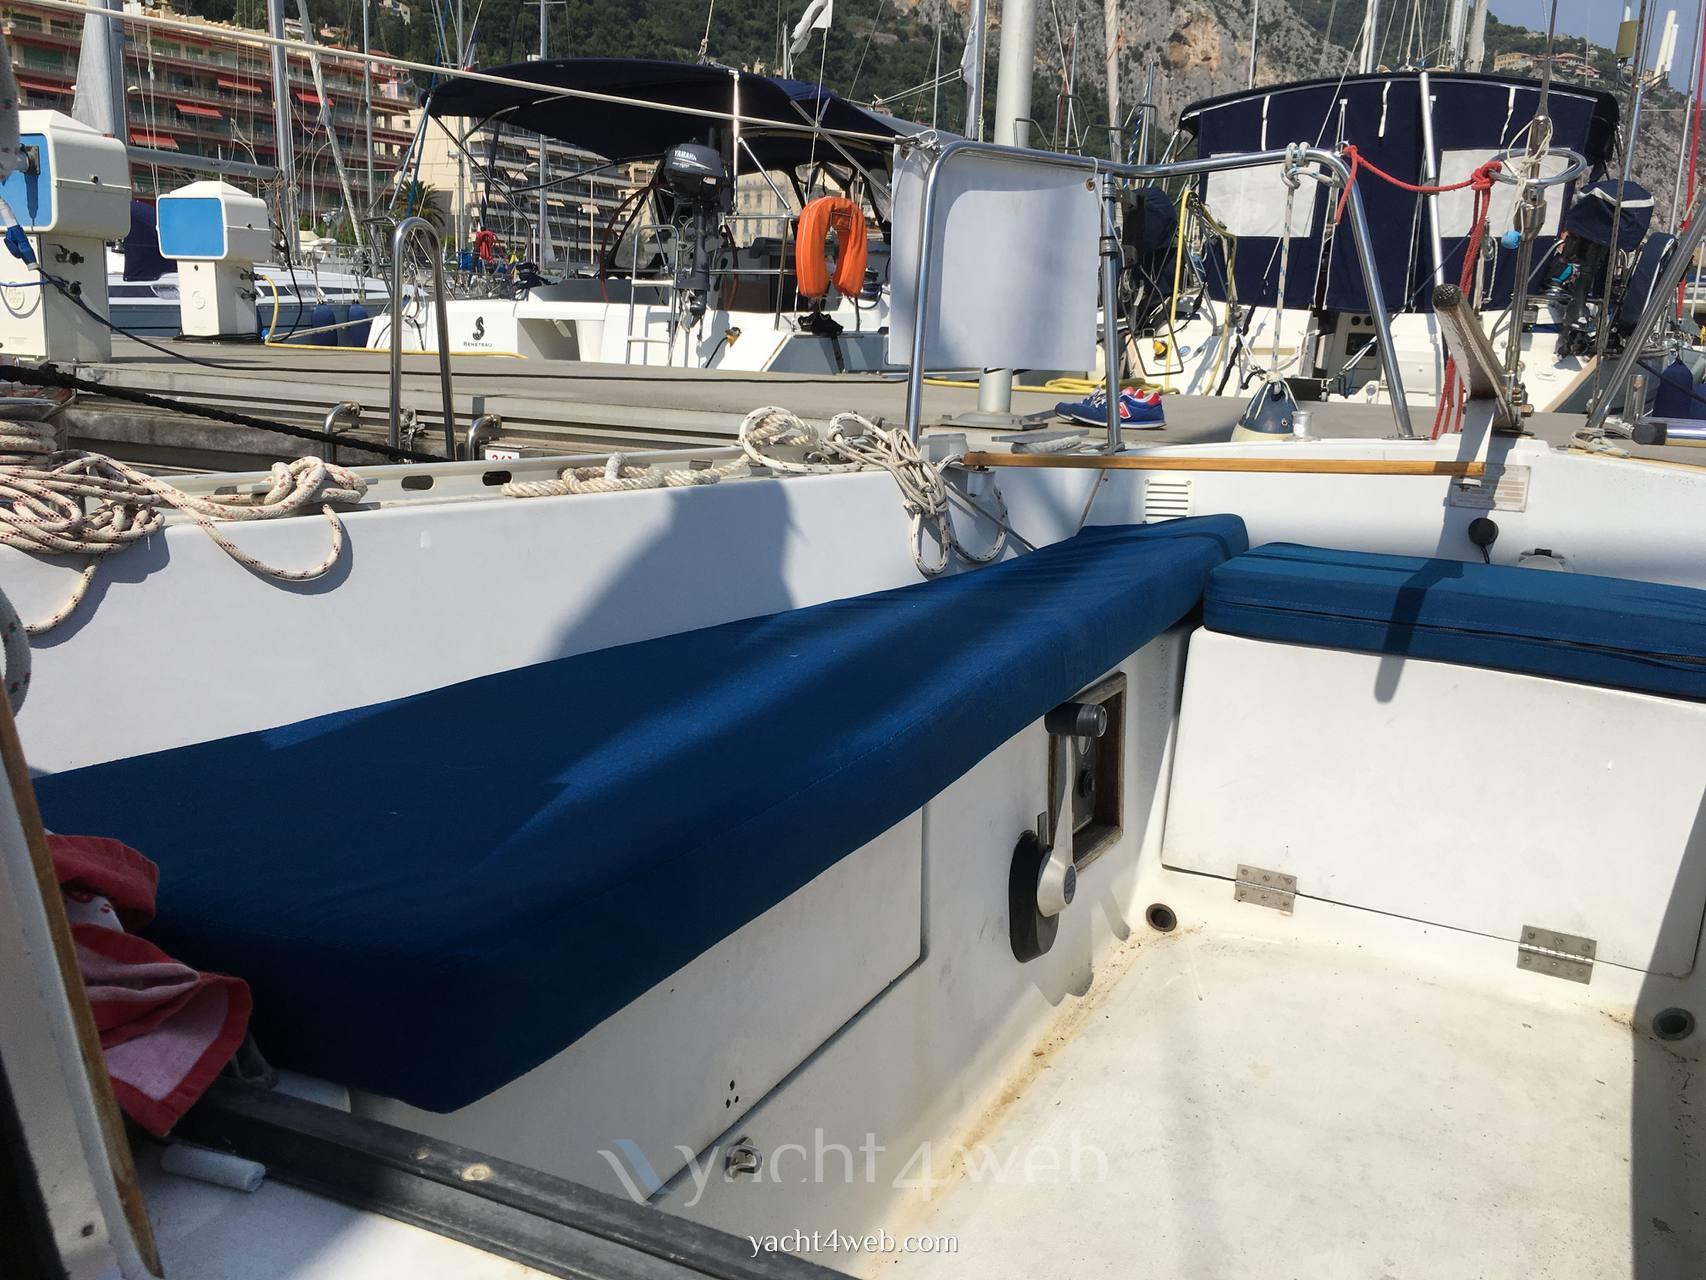 GILBERT MARINE Gib sea 26 sailing boat